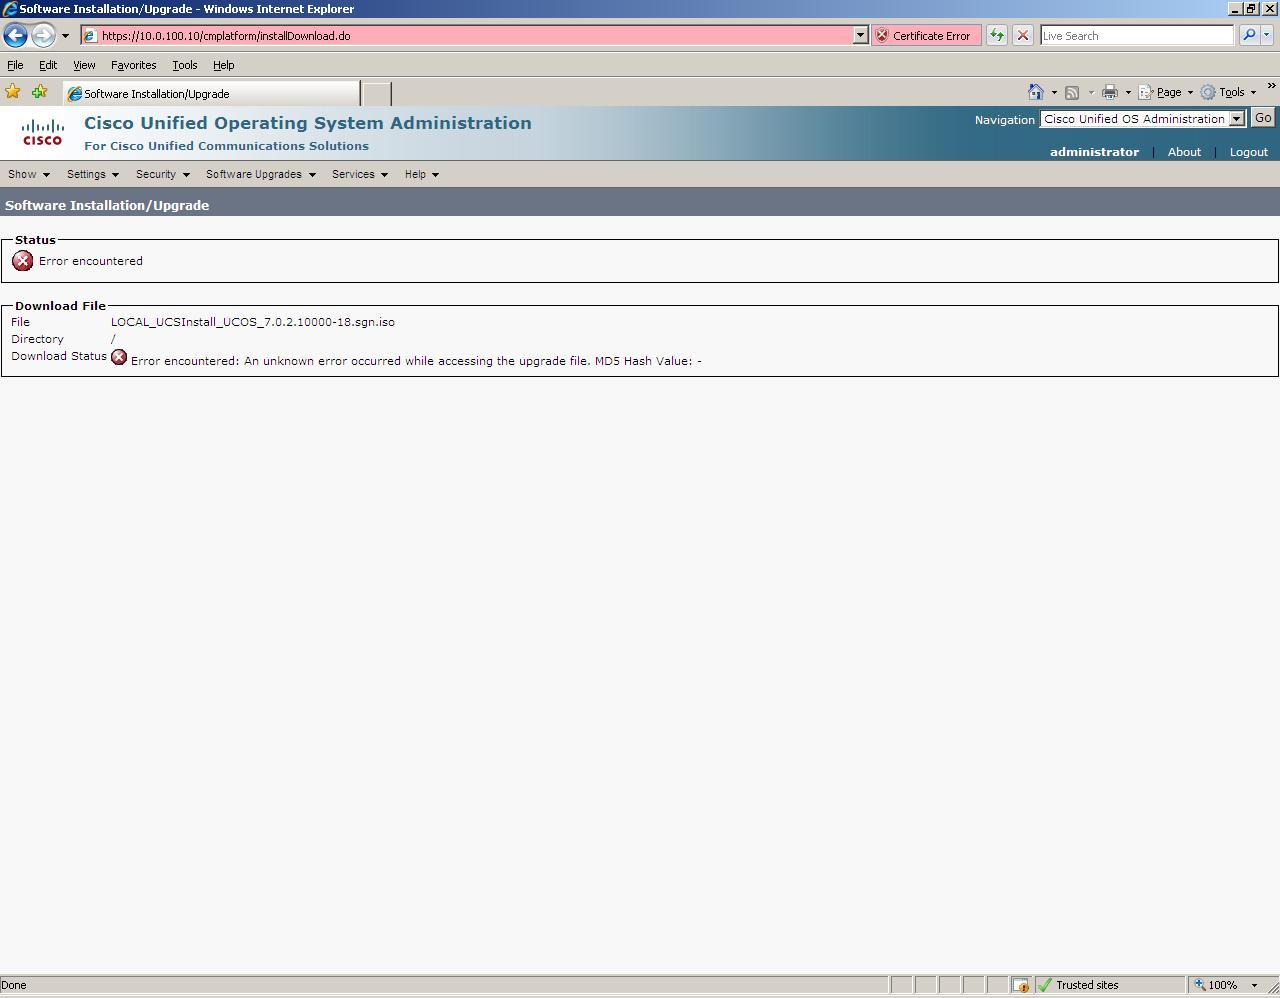 Solved: CUCM upgrade to 7 0 2 - Cisco Community